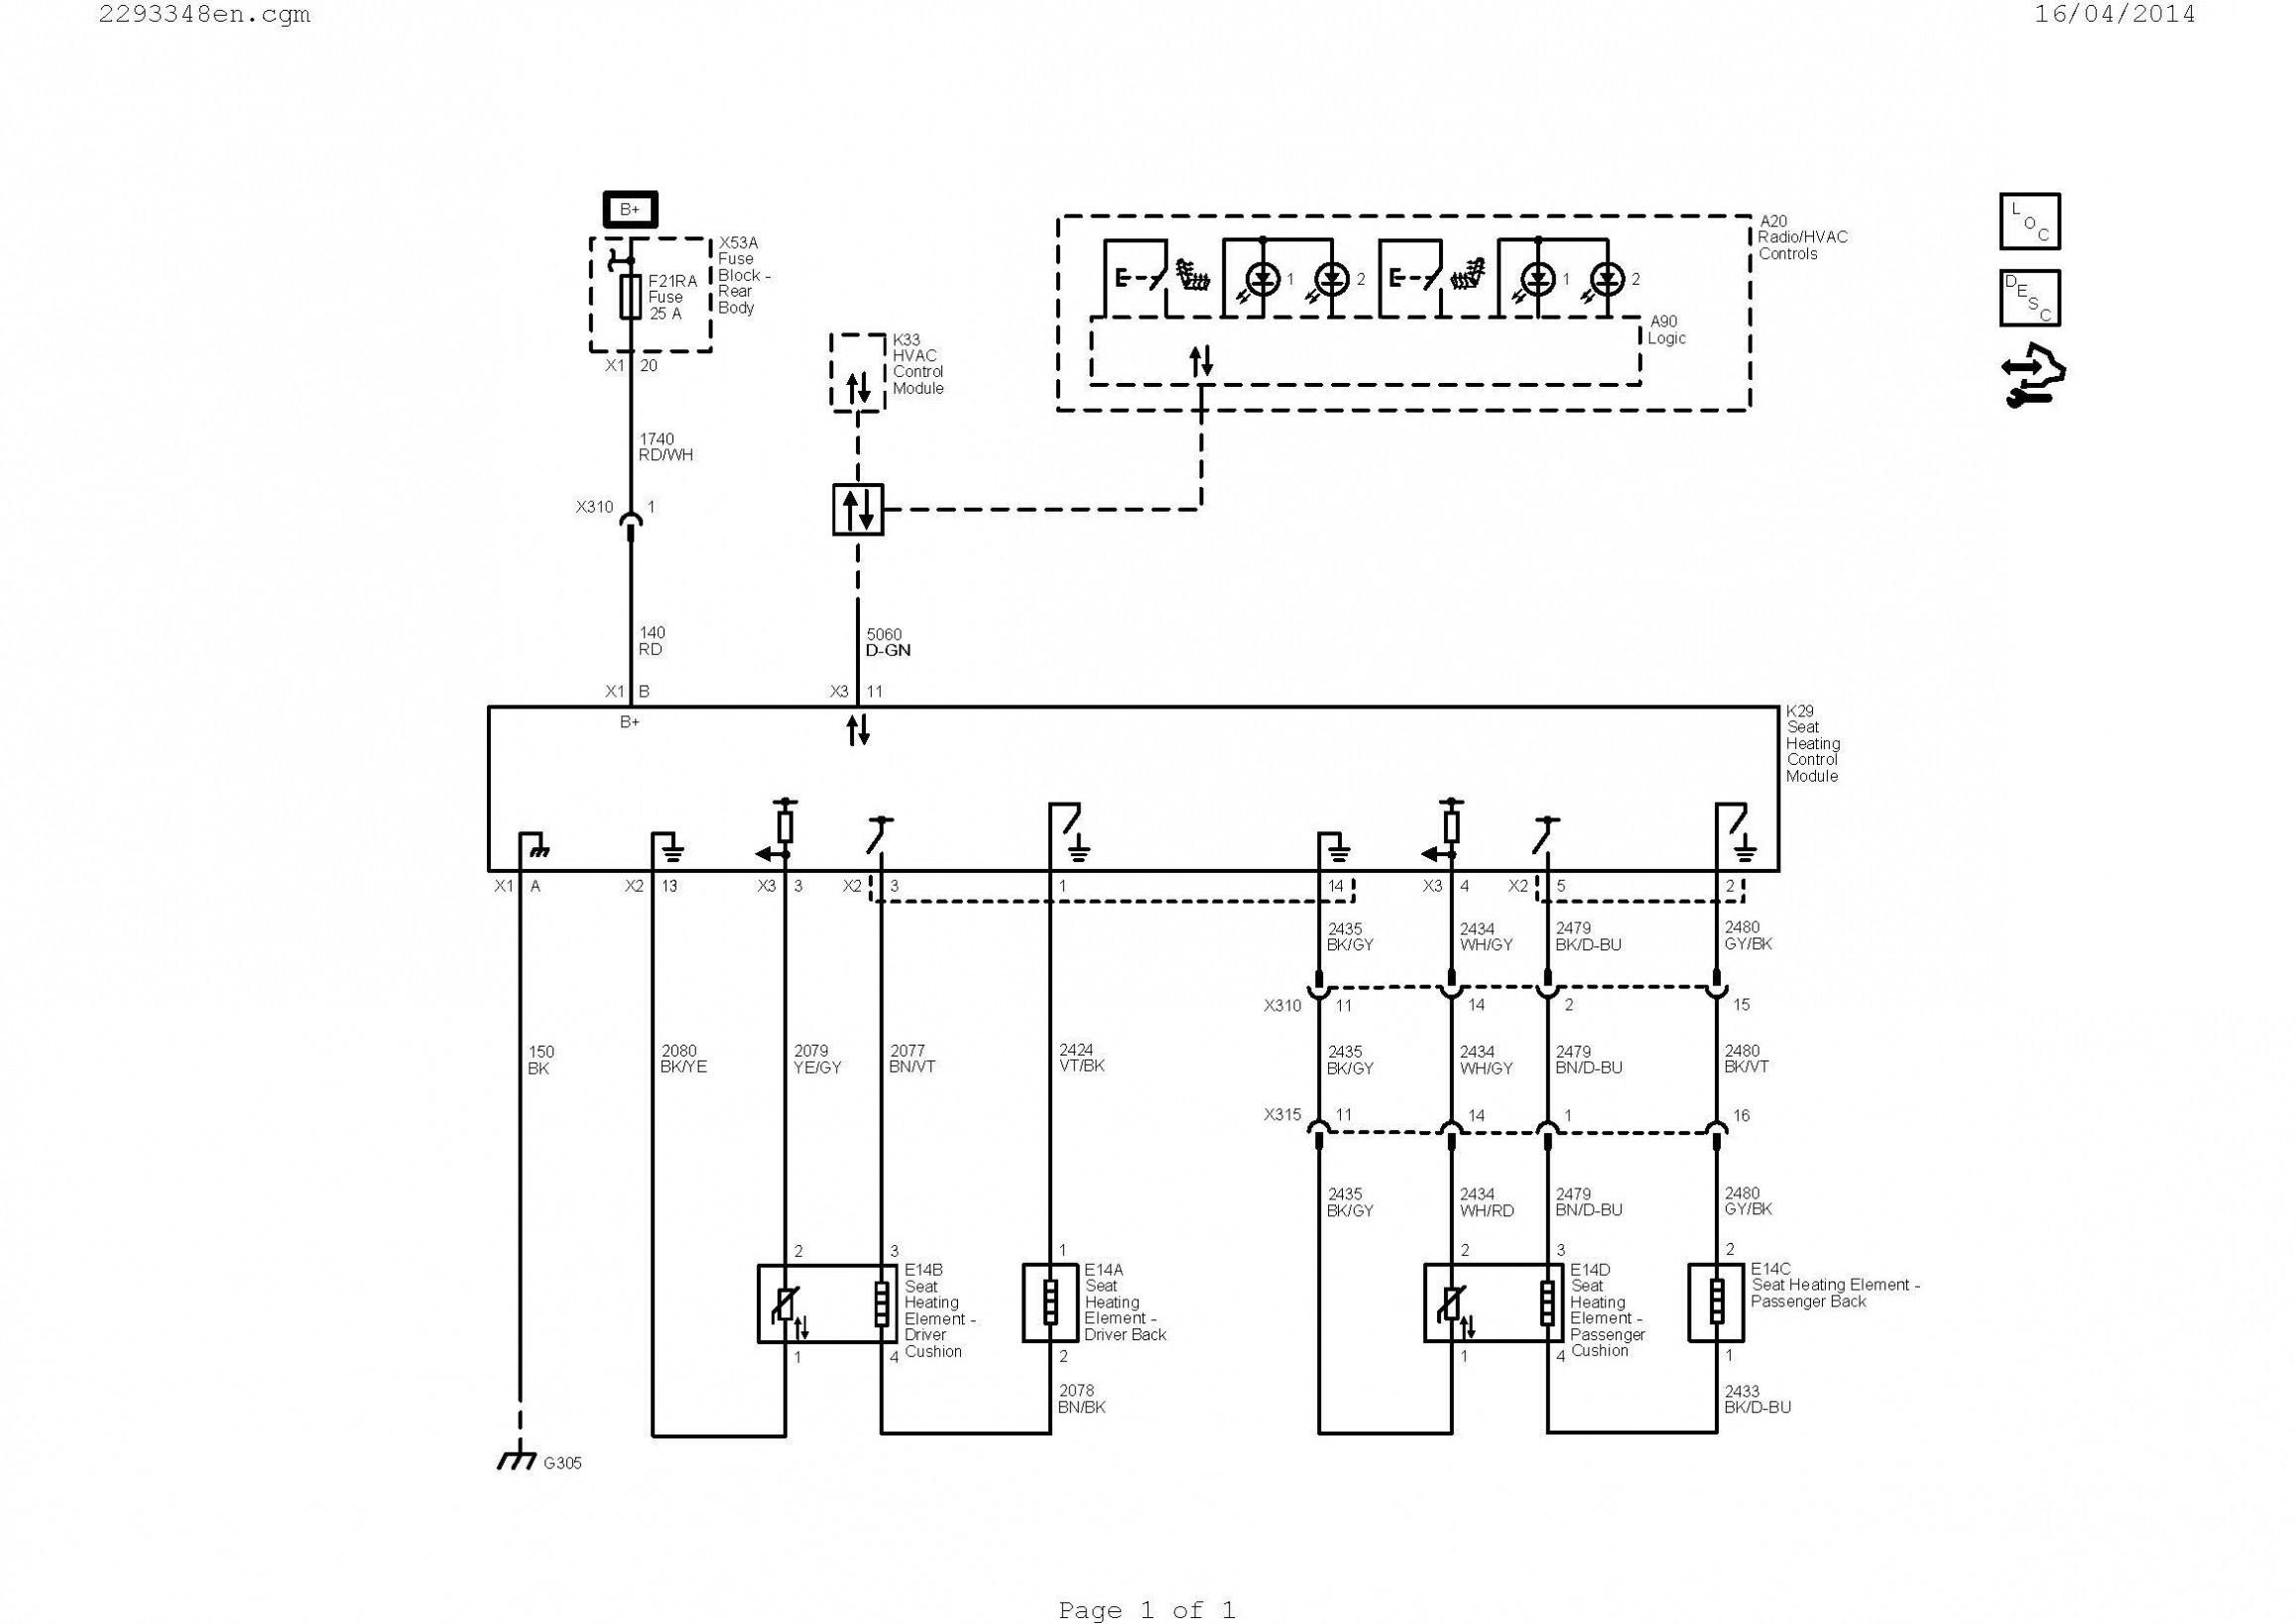 Power Window Diagram Wiring Diagram Exhaust Fan New Relay Wiring Diagram Best Wire